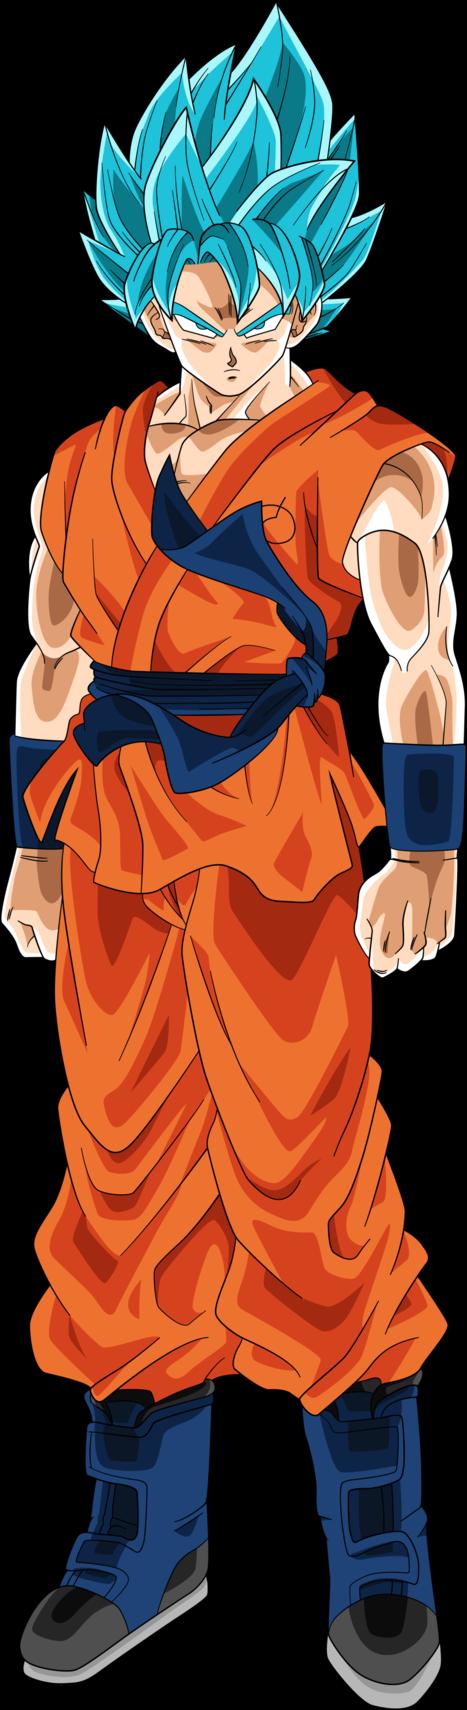 SSGSS Goku (Dragonball Heroes) Alt Palette by RayzorBlade189